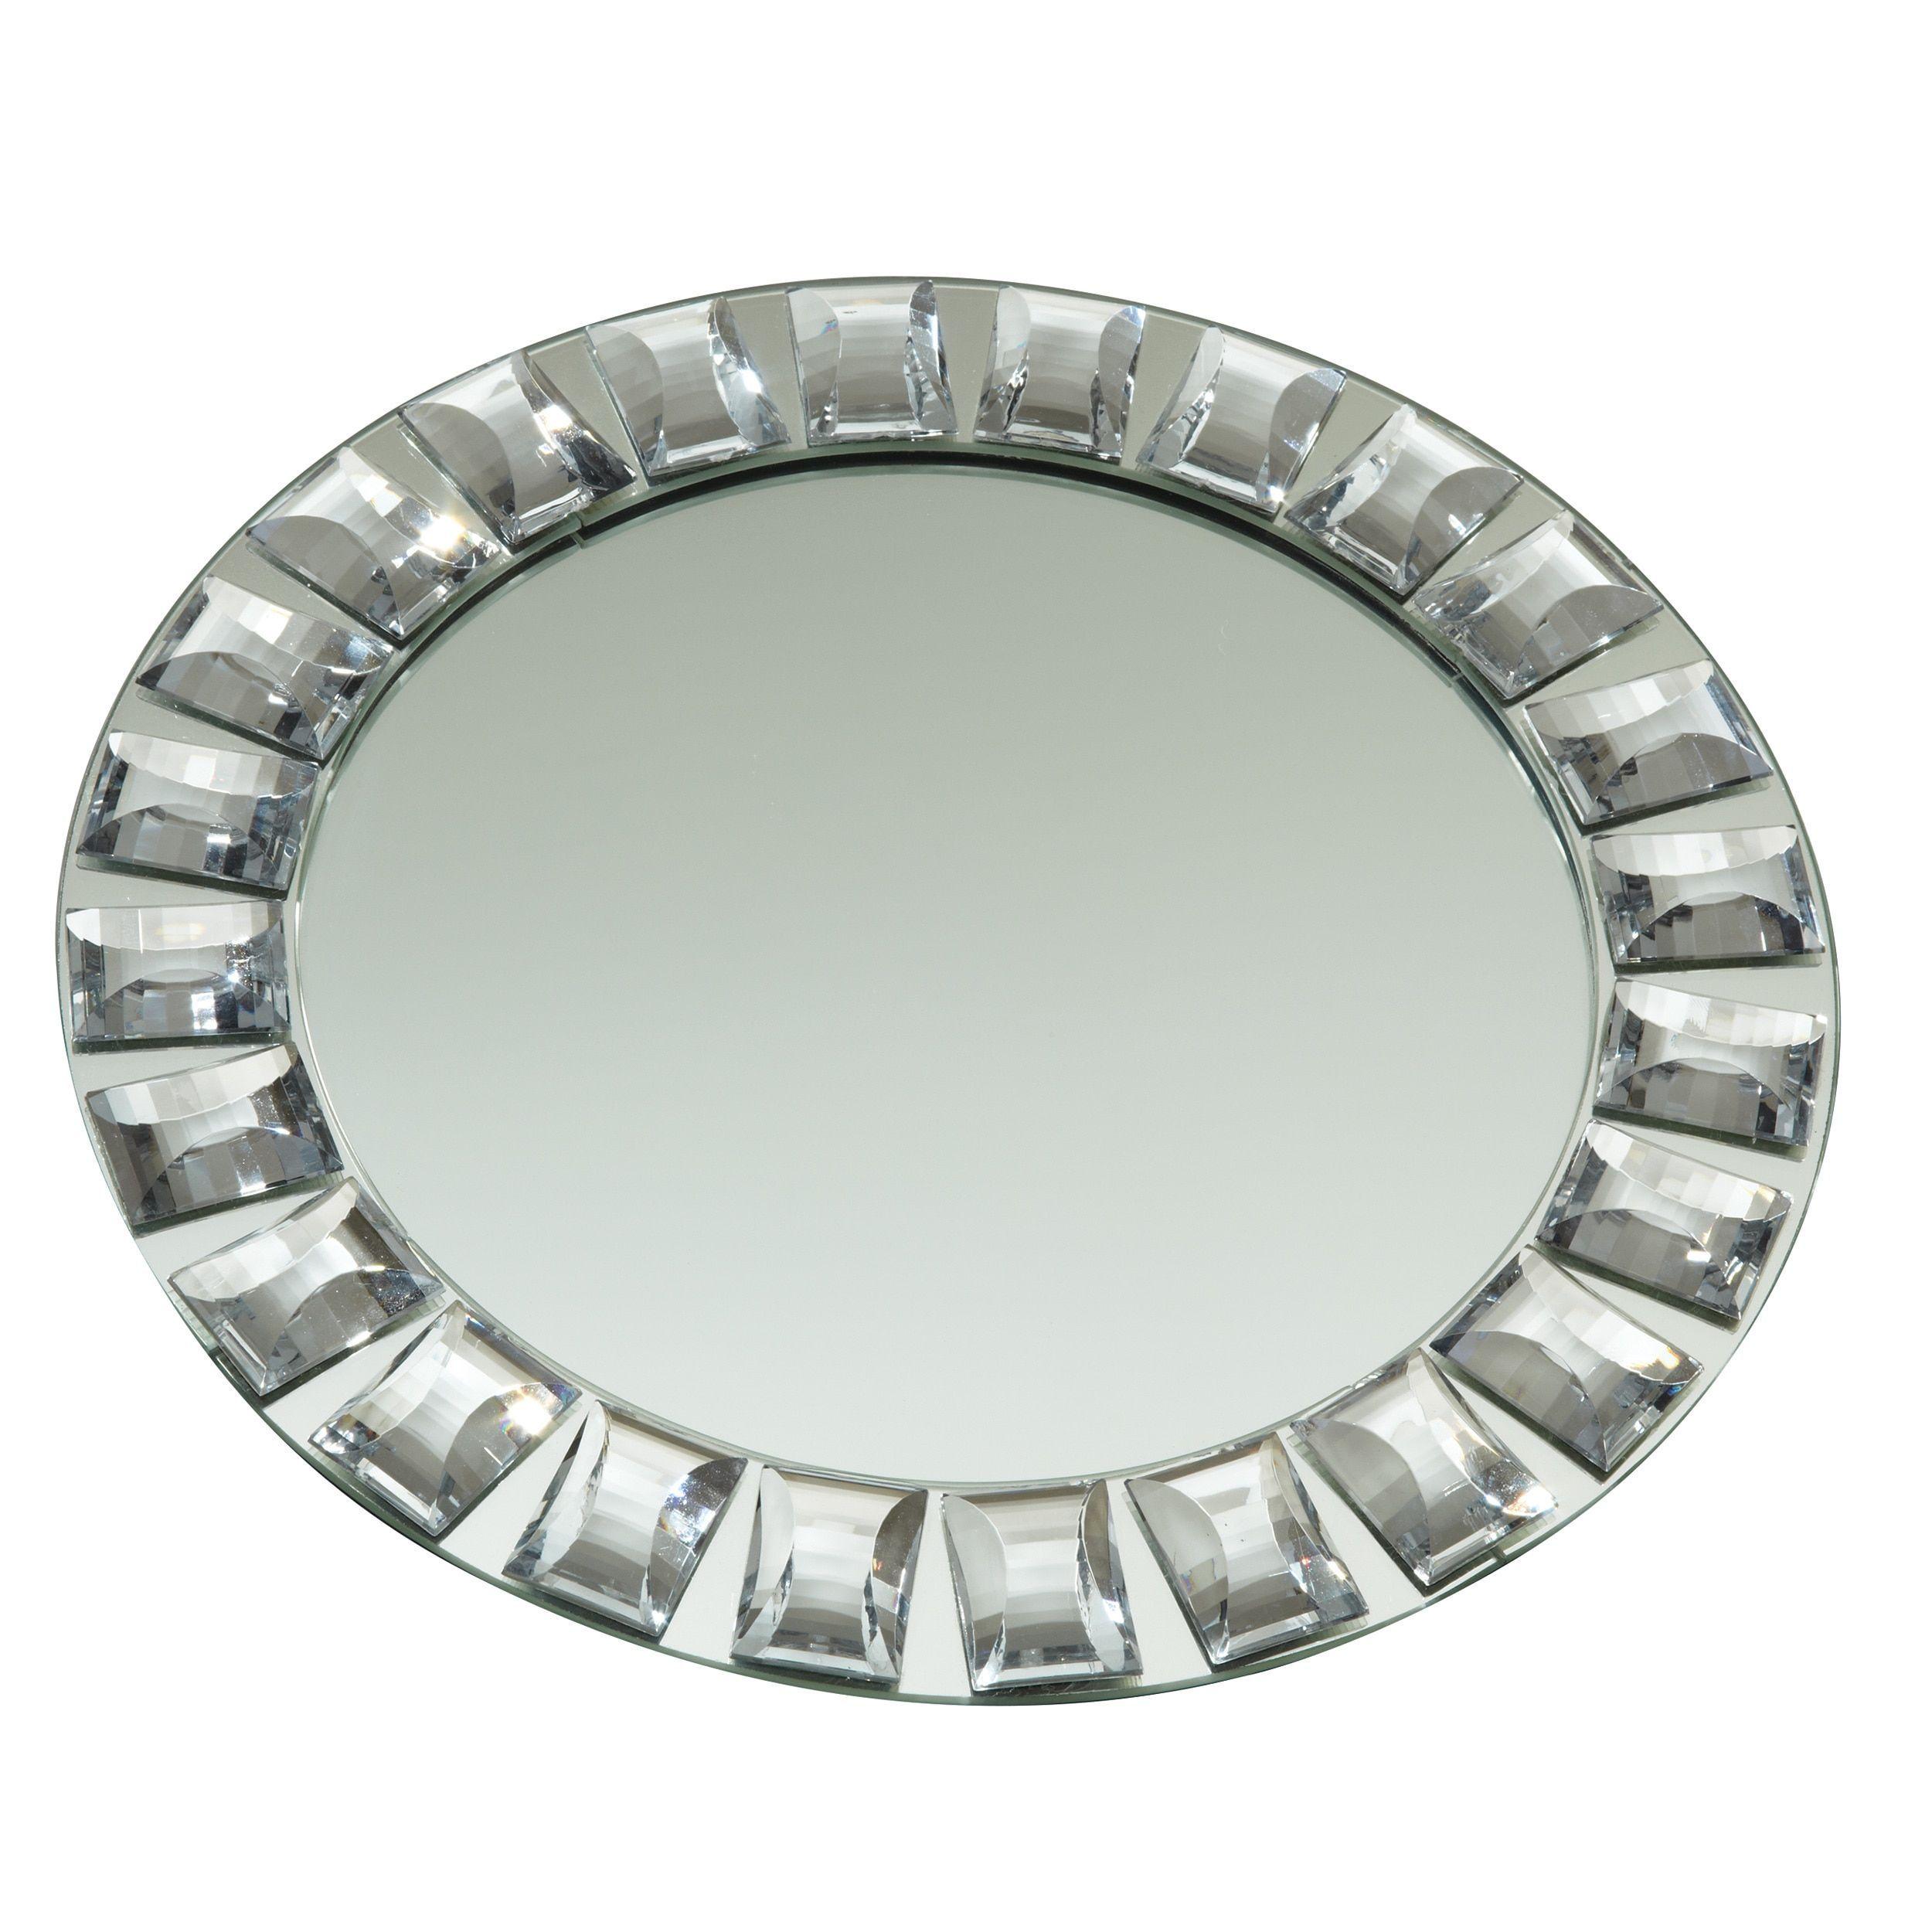 Elegance Diamond Rim Mirror Charger Plate, 13 dia. (Silver) (Metal ...